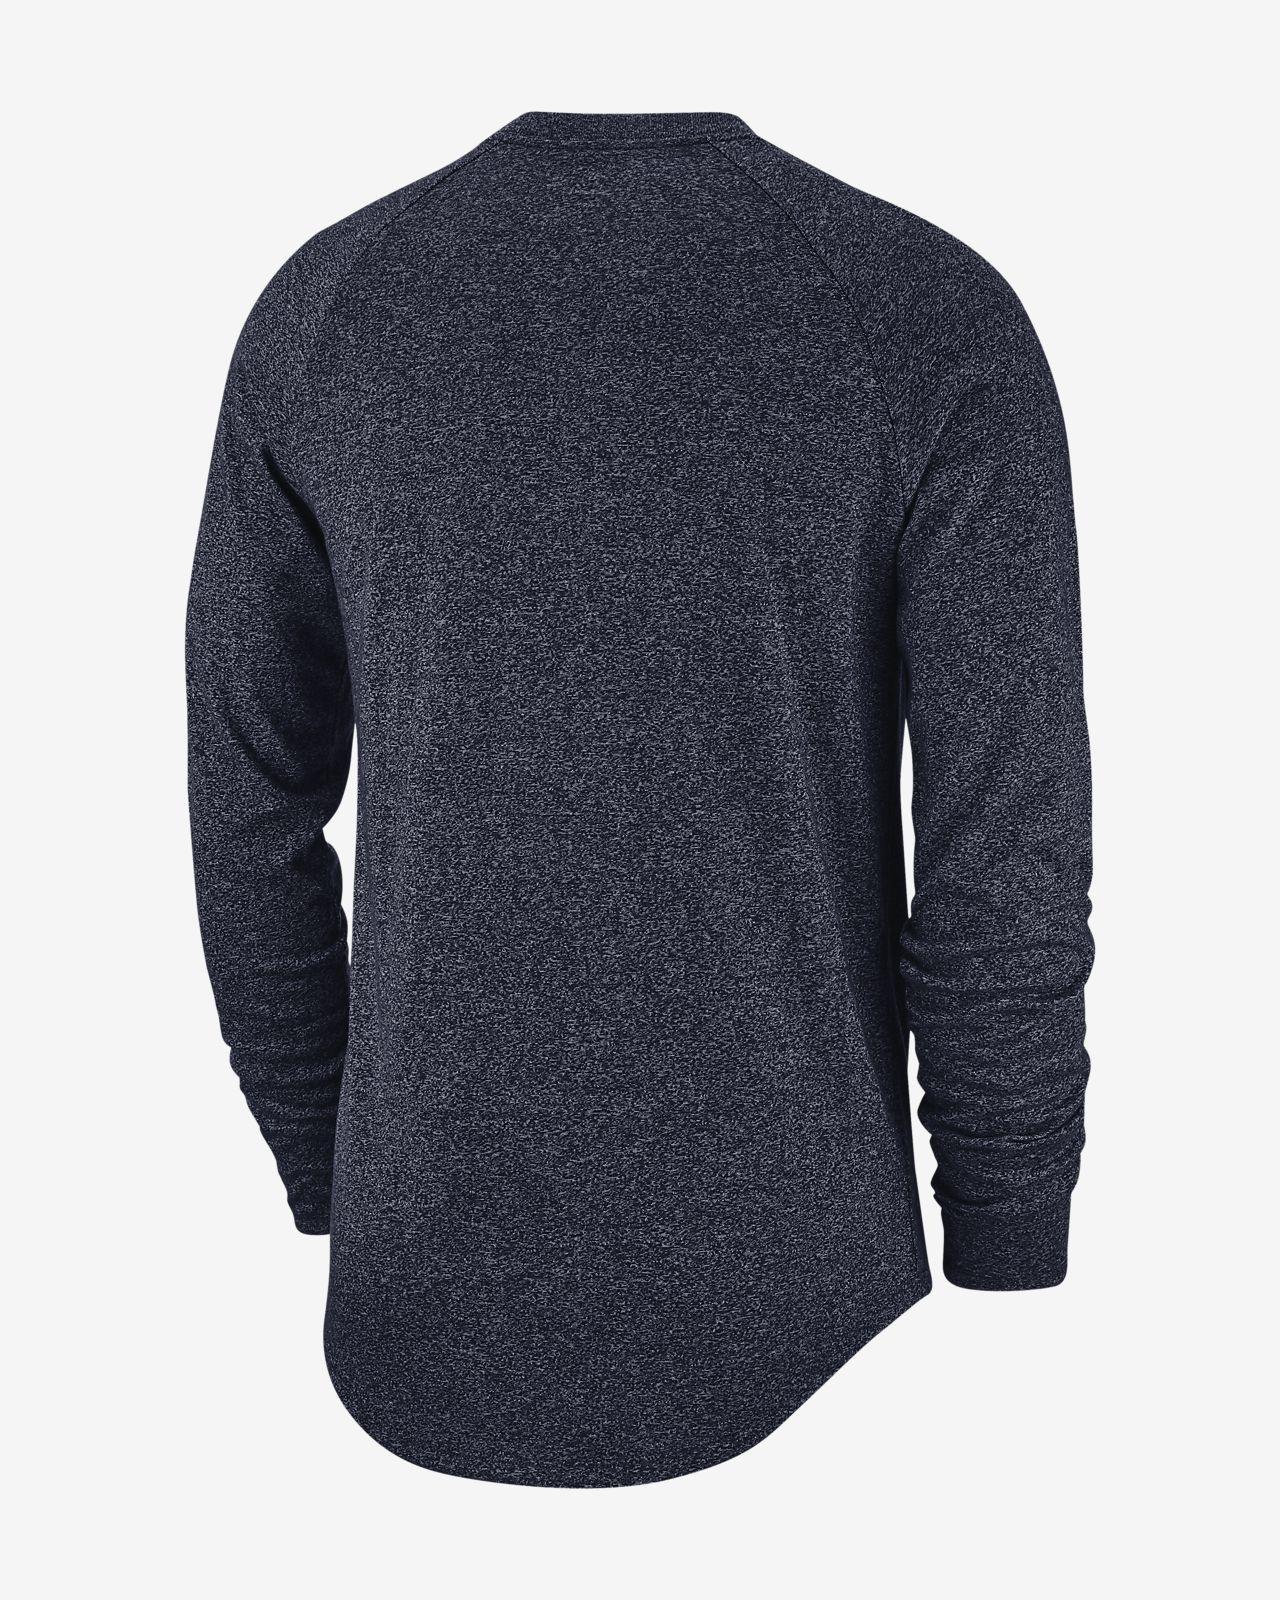 new arrival d8ab3 fb9a0 Nike Historic (NFL Giants) Men's Long-Sleeve T-Shirt